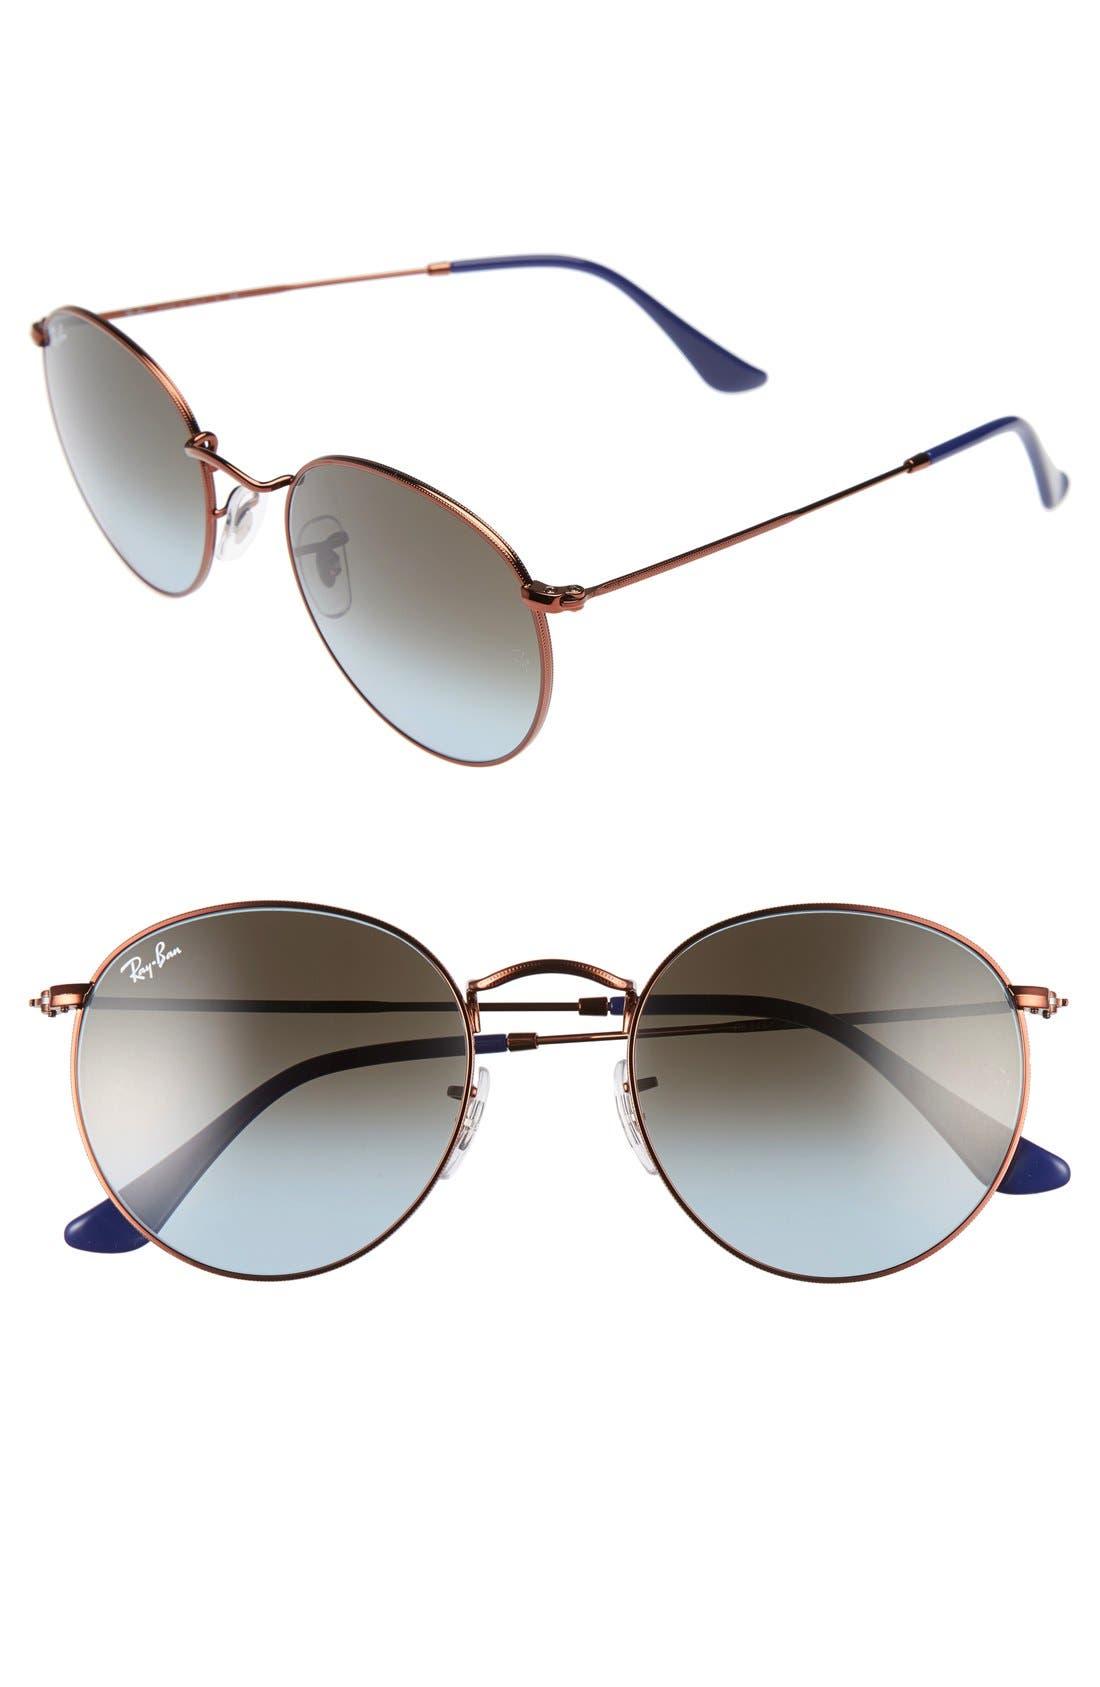 Icons 50mm Retro Sunglasses,                             Main thumbnail 2, color,